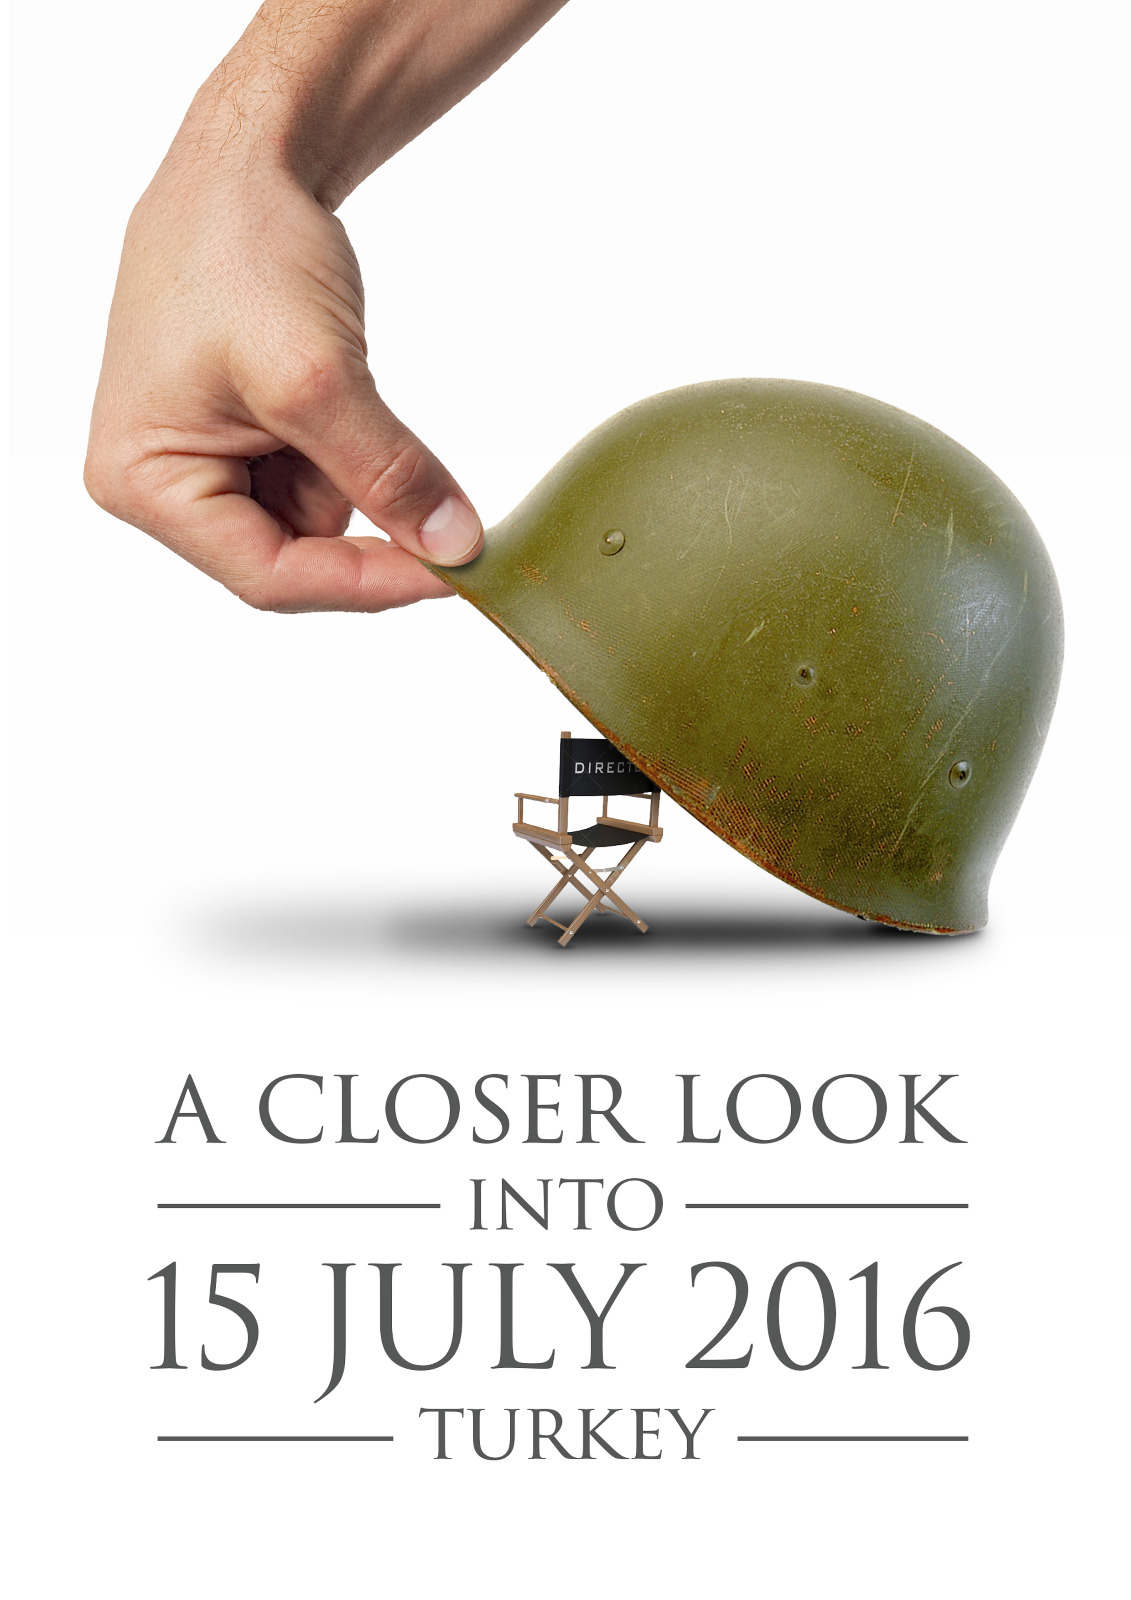 A Closer Look into 15 July 2016Turkey